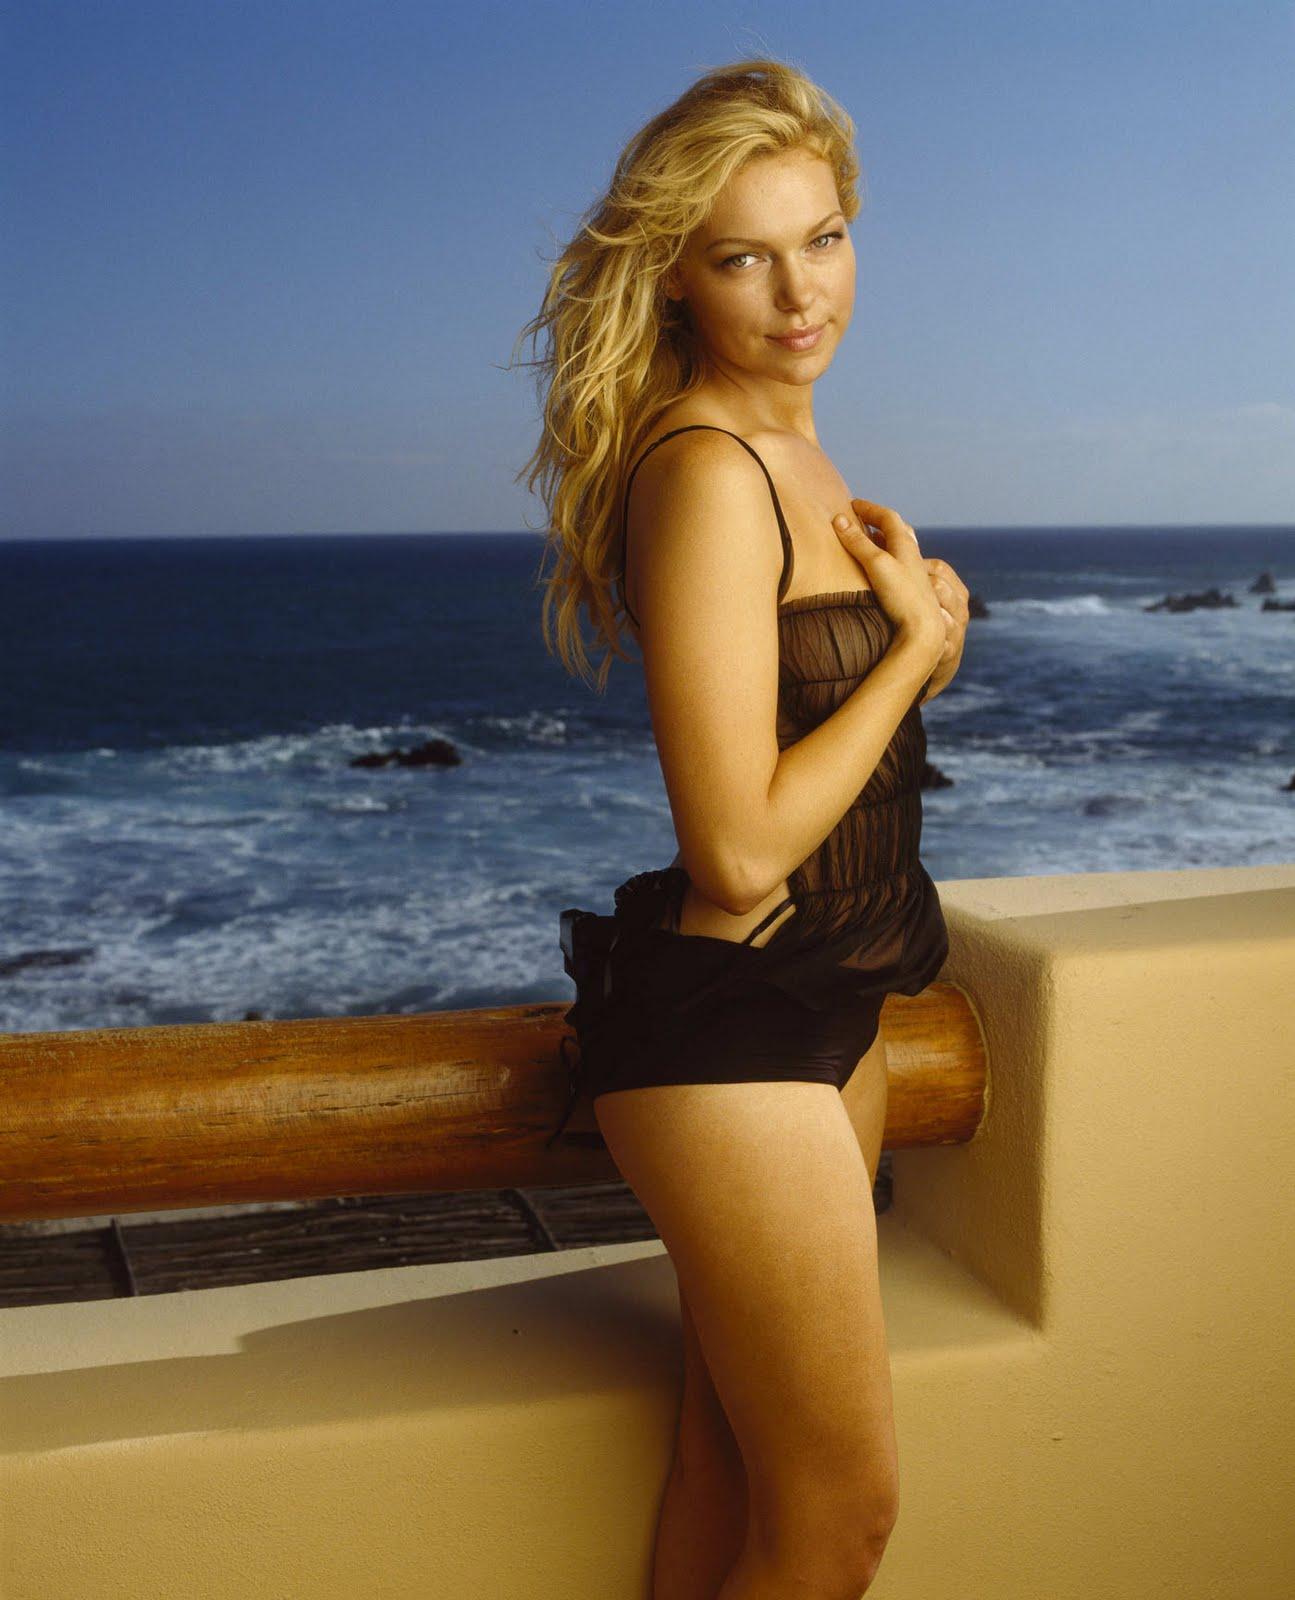 Laura prepon bikini